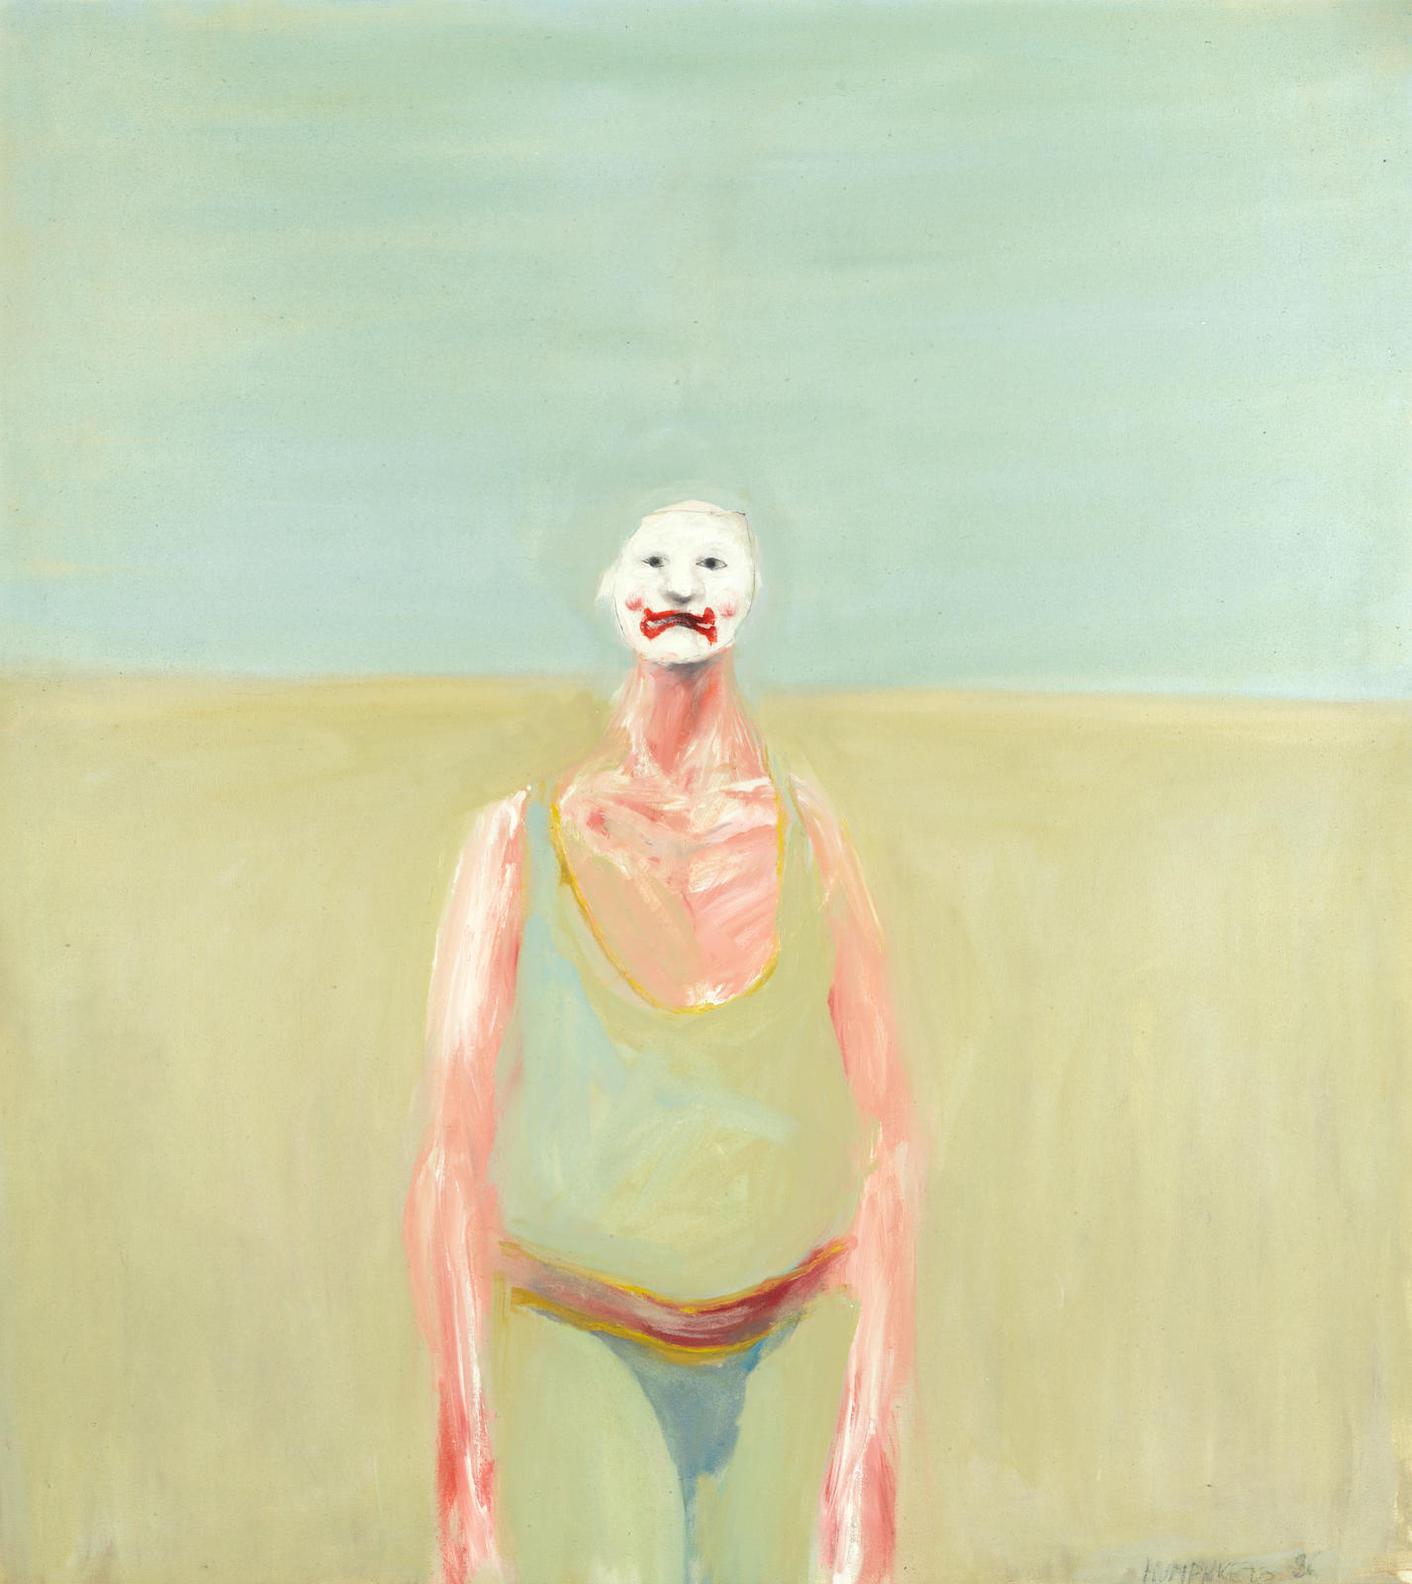 Ian Humphreys - The Clown-1986